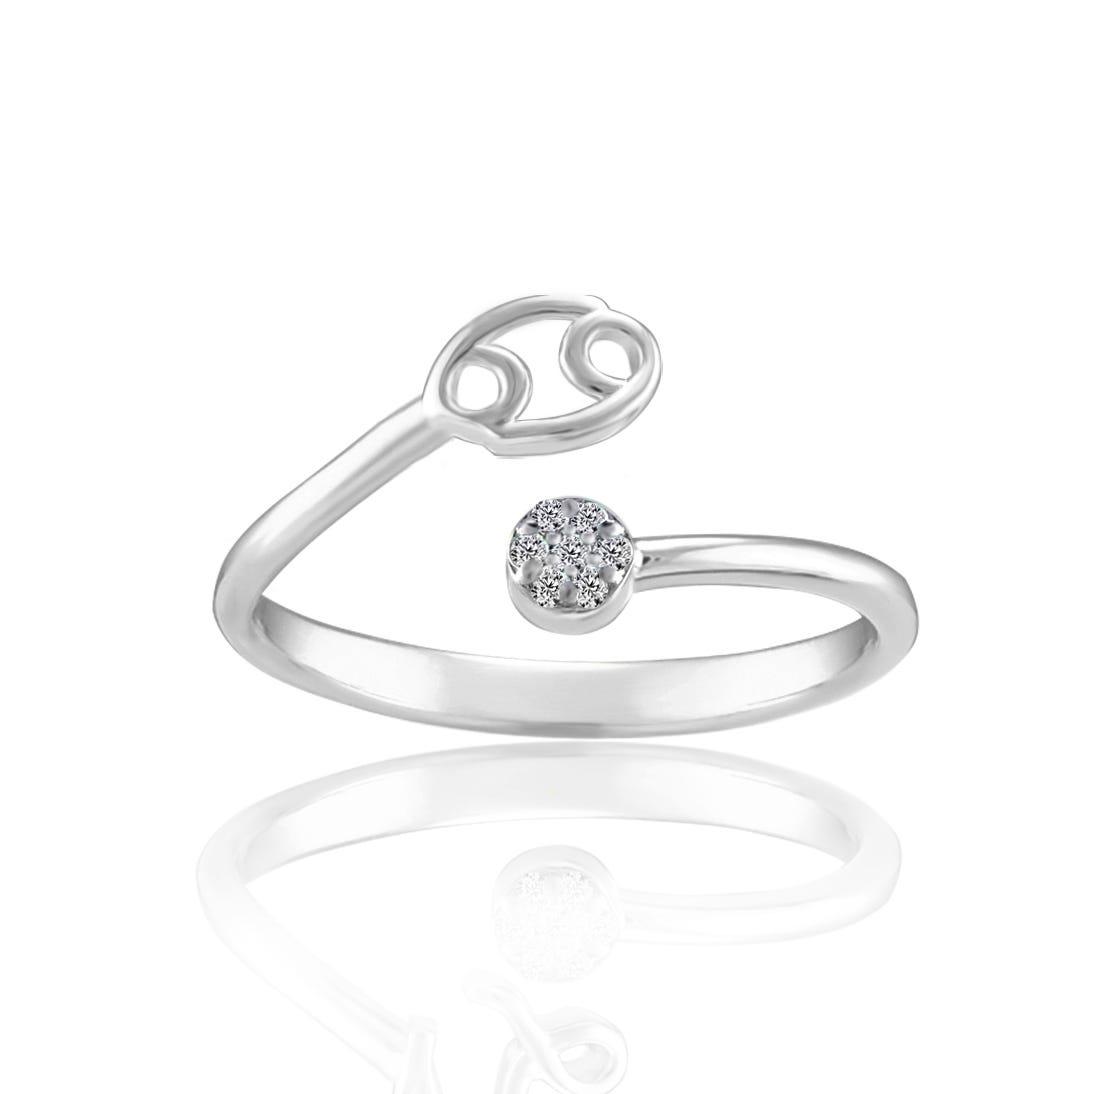 Zodiac Diamond Cancer Fashion Ring in Sterling Silver